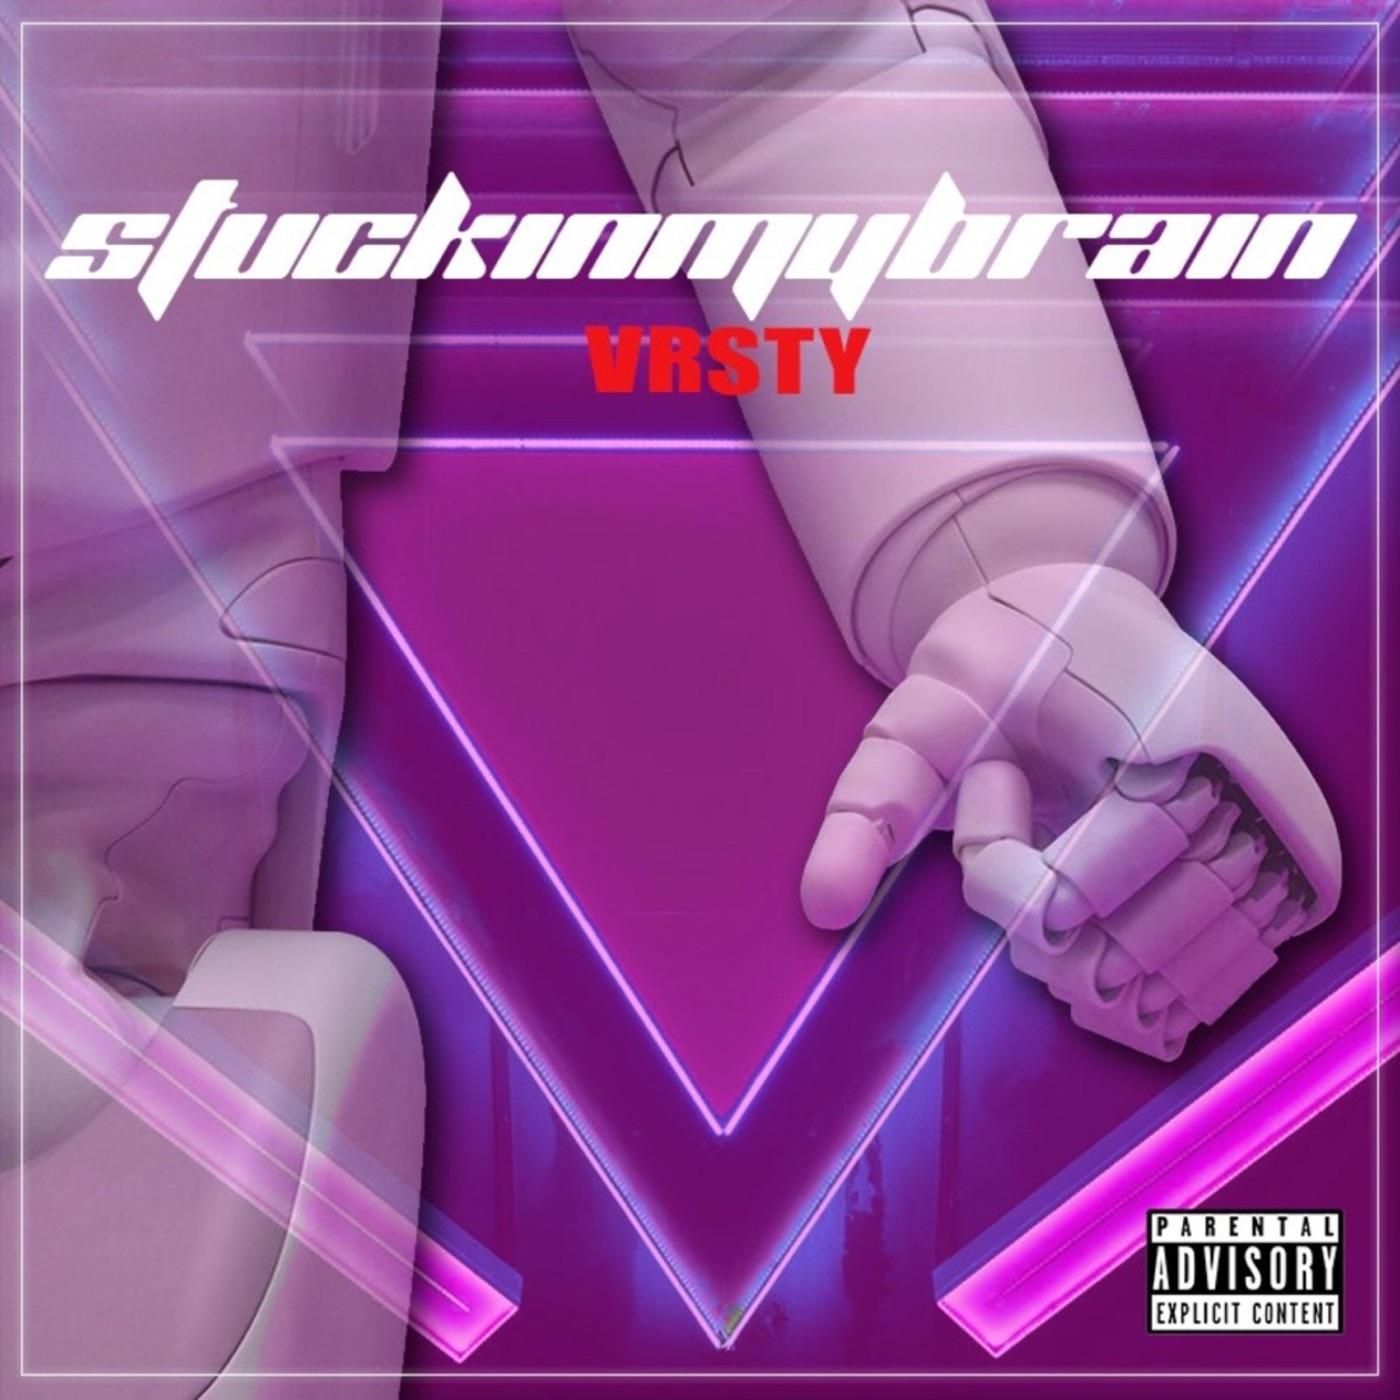 VRSTY - Stuckinmybrain [single] (Chase Atlantic cover) (2019)